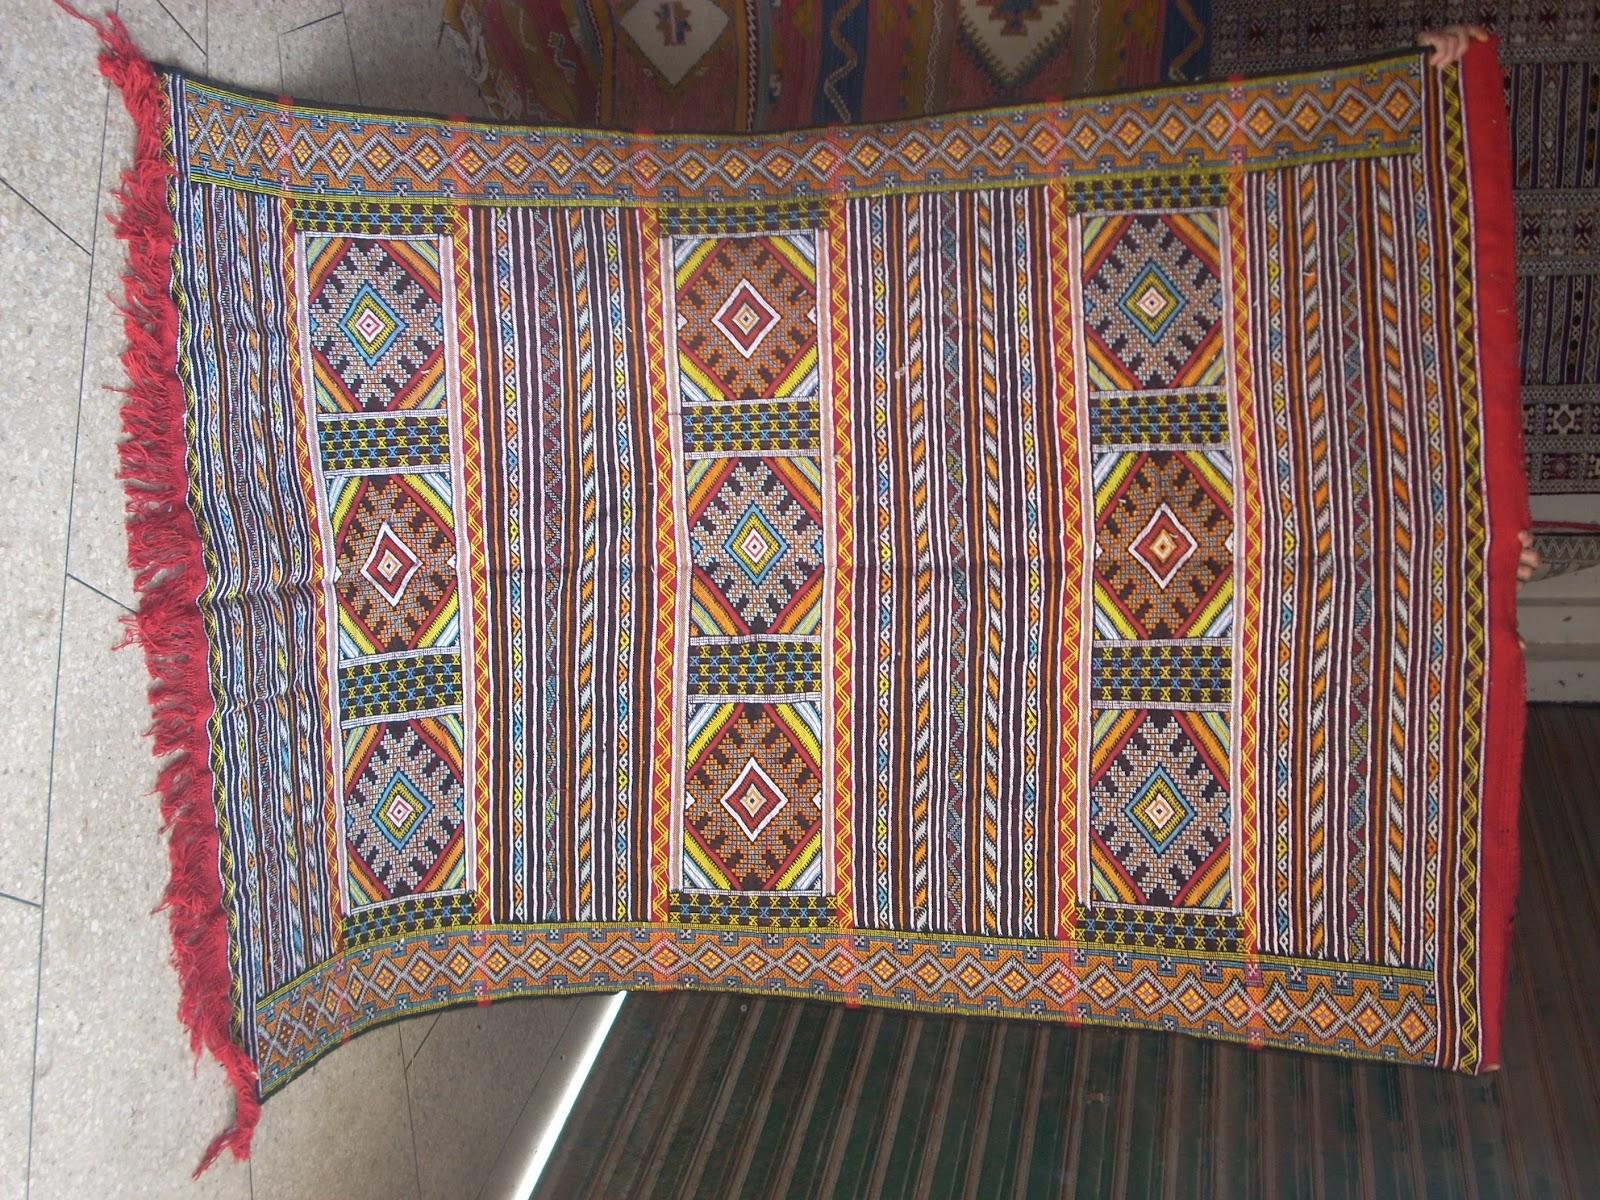 tapis kilim marocaine le reste des dimensions 3. Black Bedroom Furniture Sets. Home Design Ideas